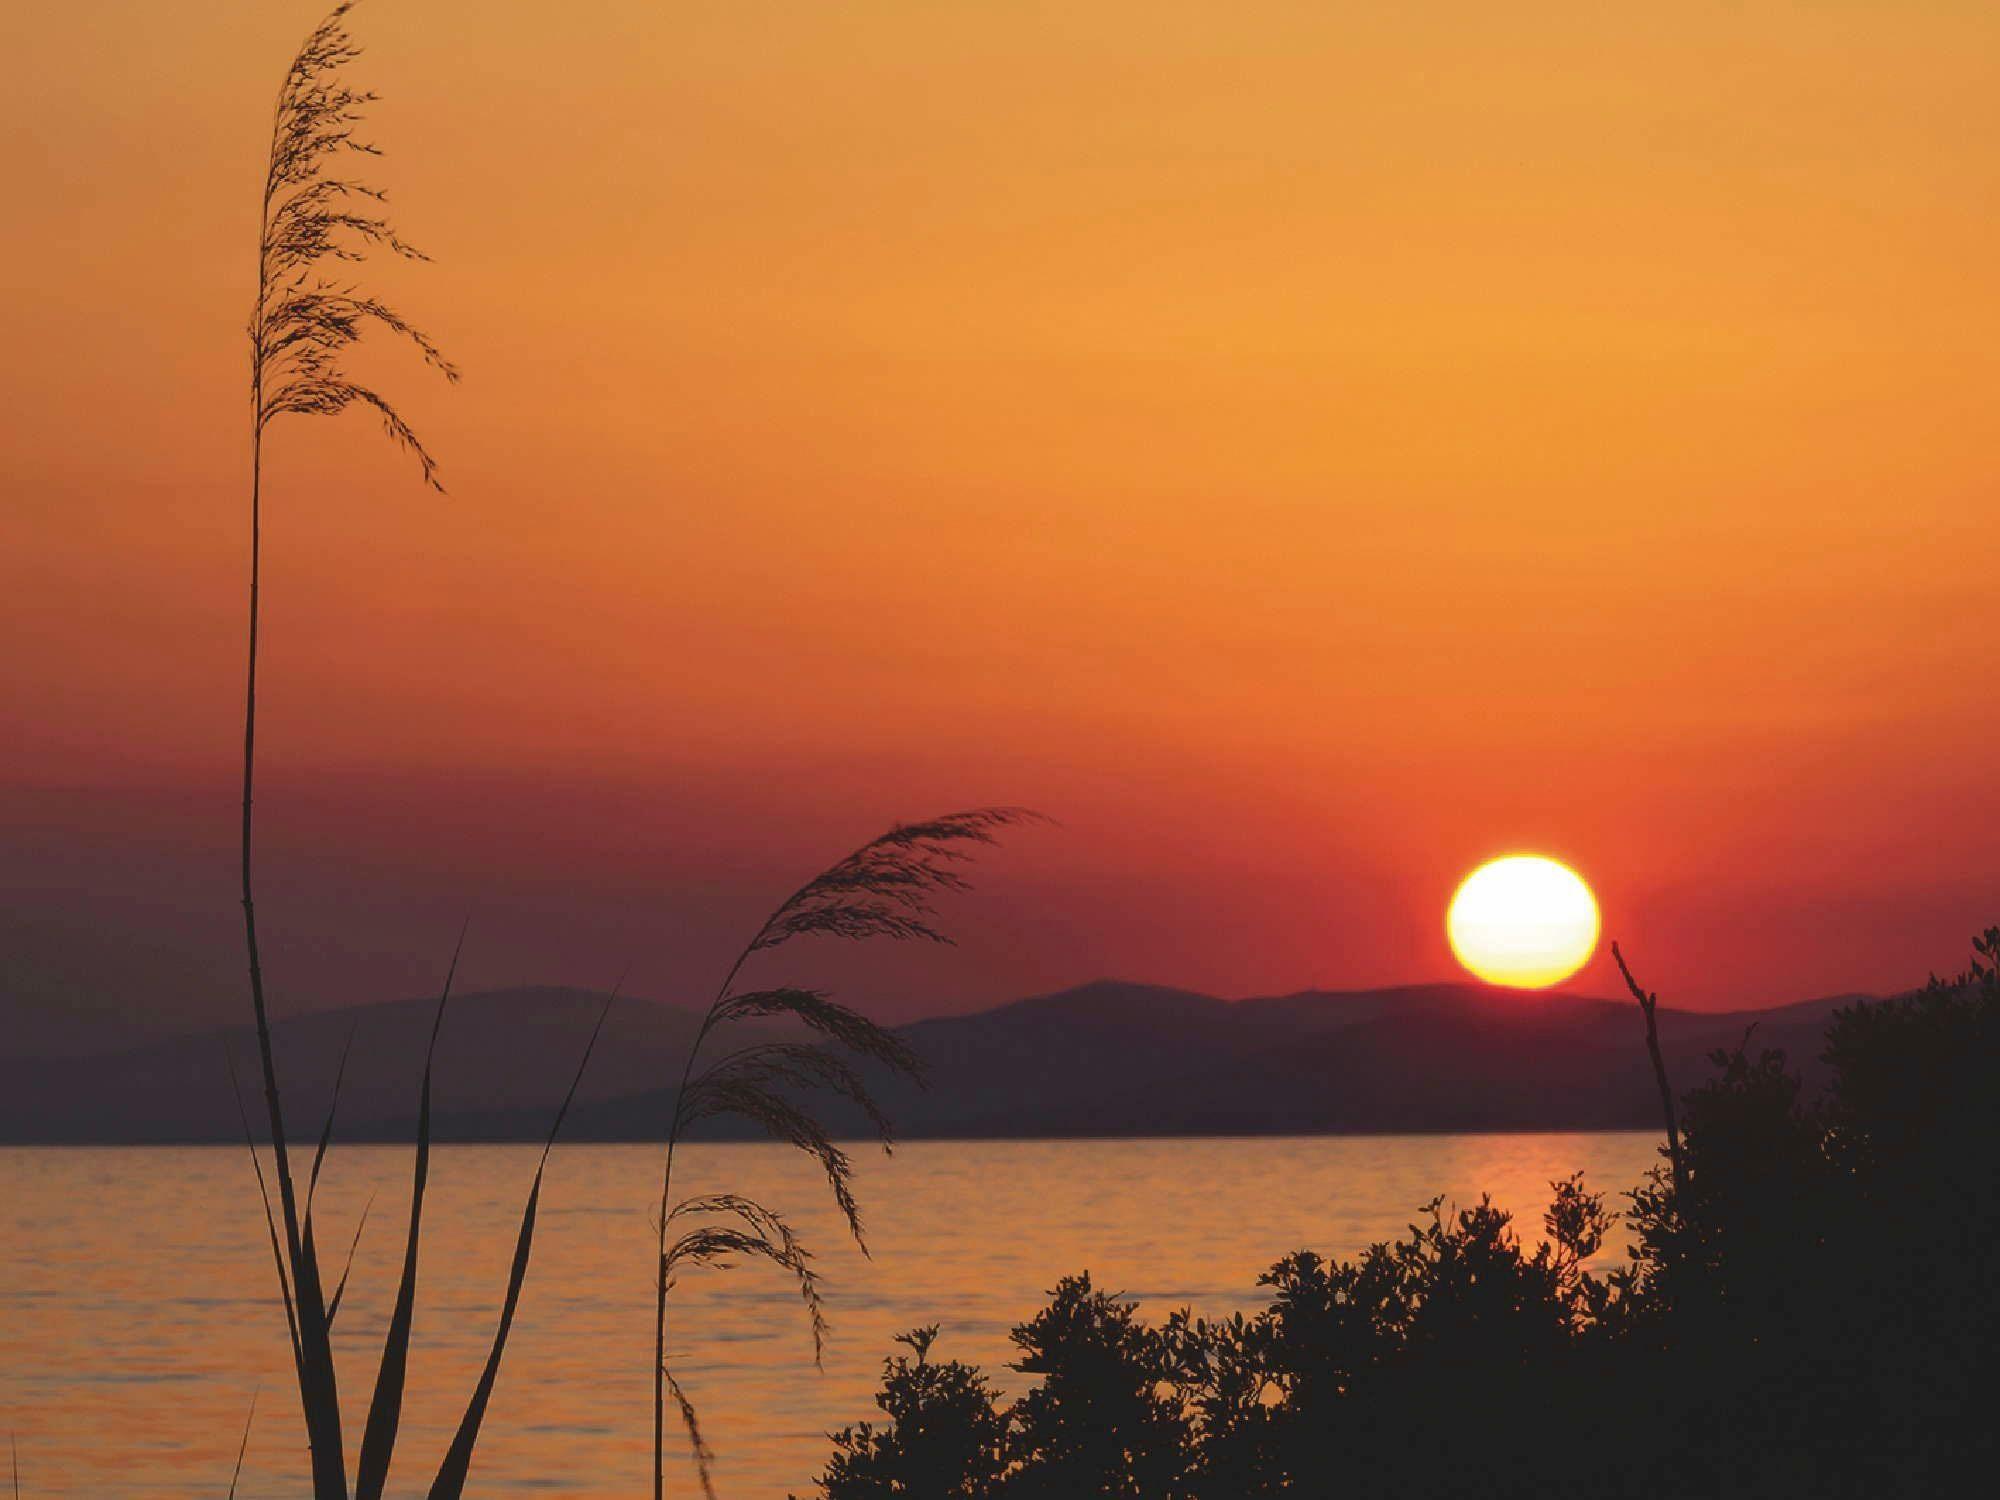 Home affaire Glasbild »Ageev Rostislav: Sonnenuntergang in Griechenland«, 80/60 cm